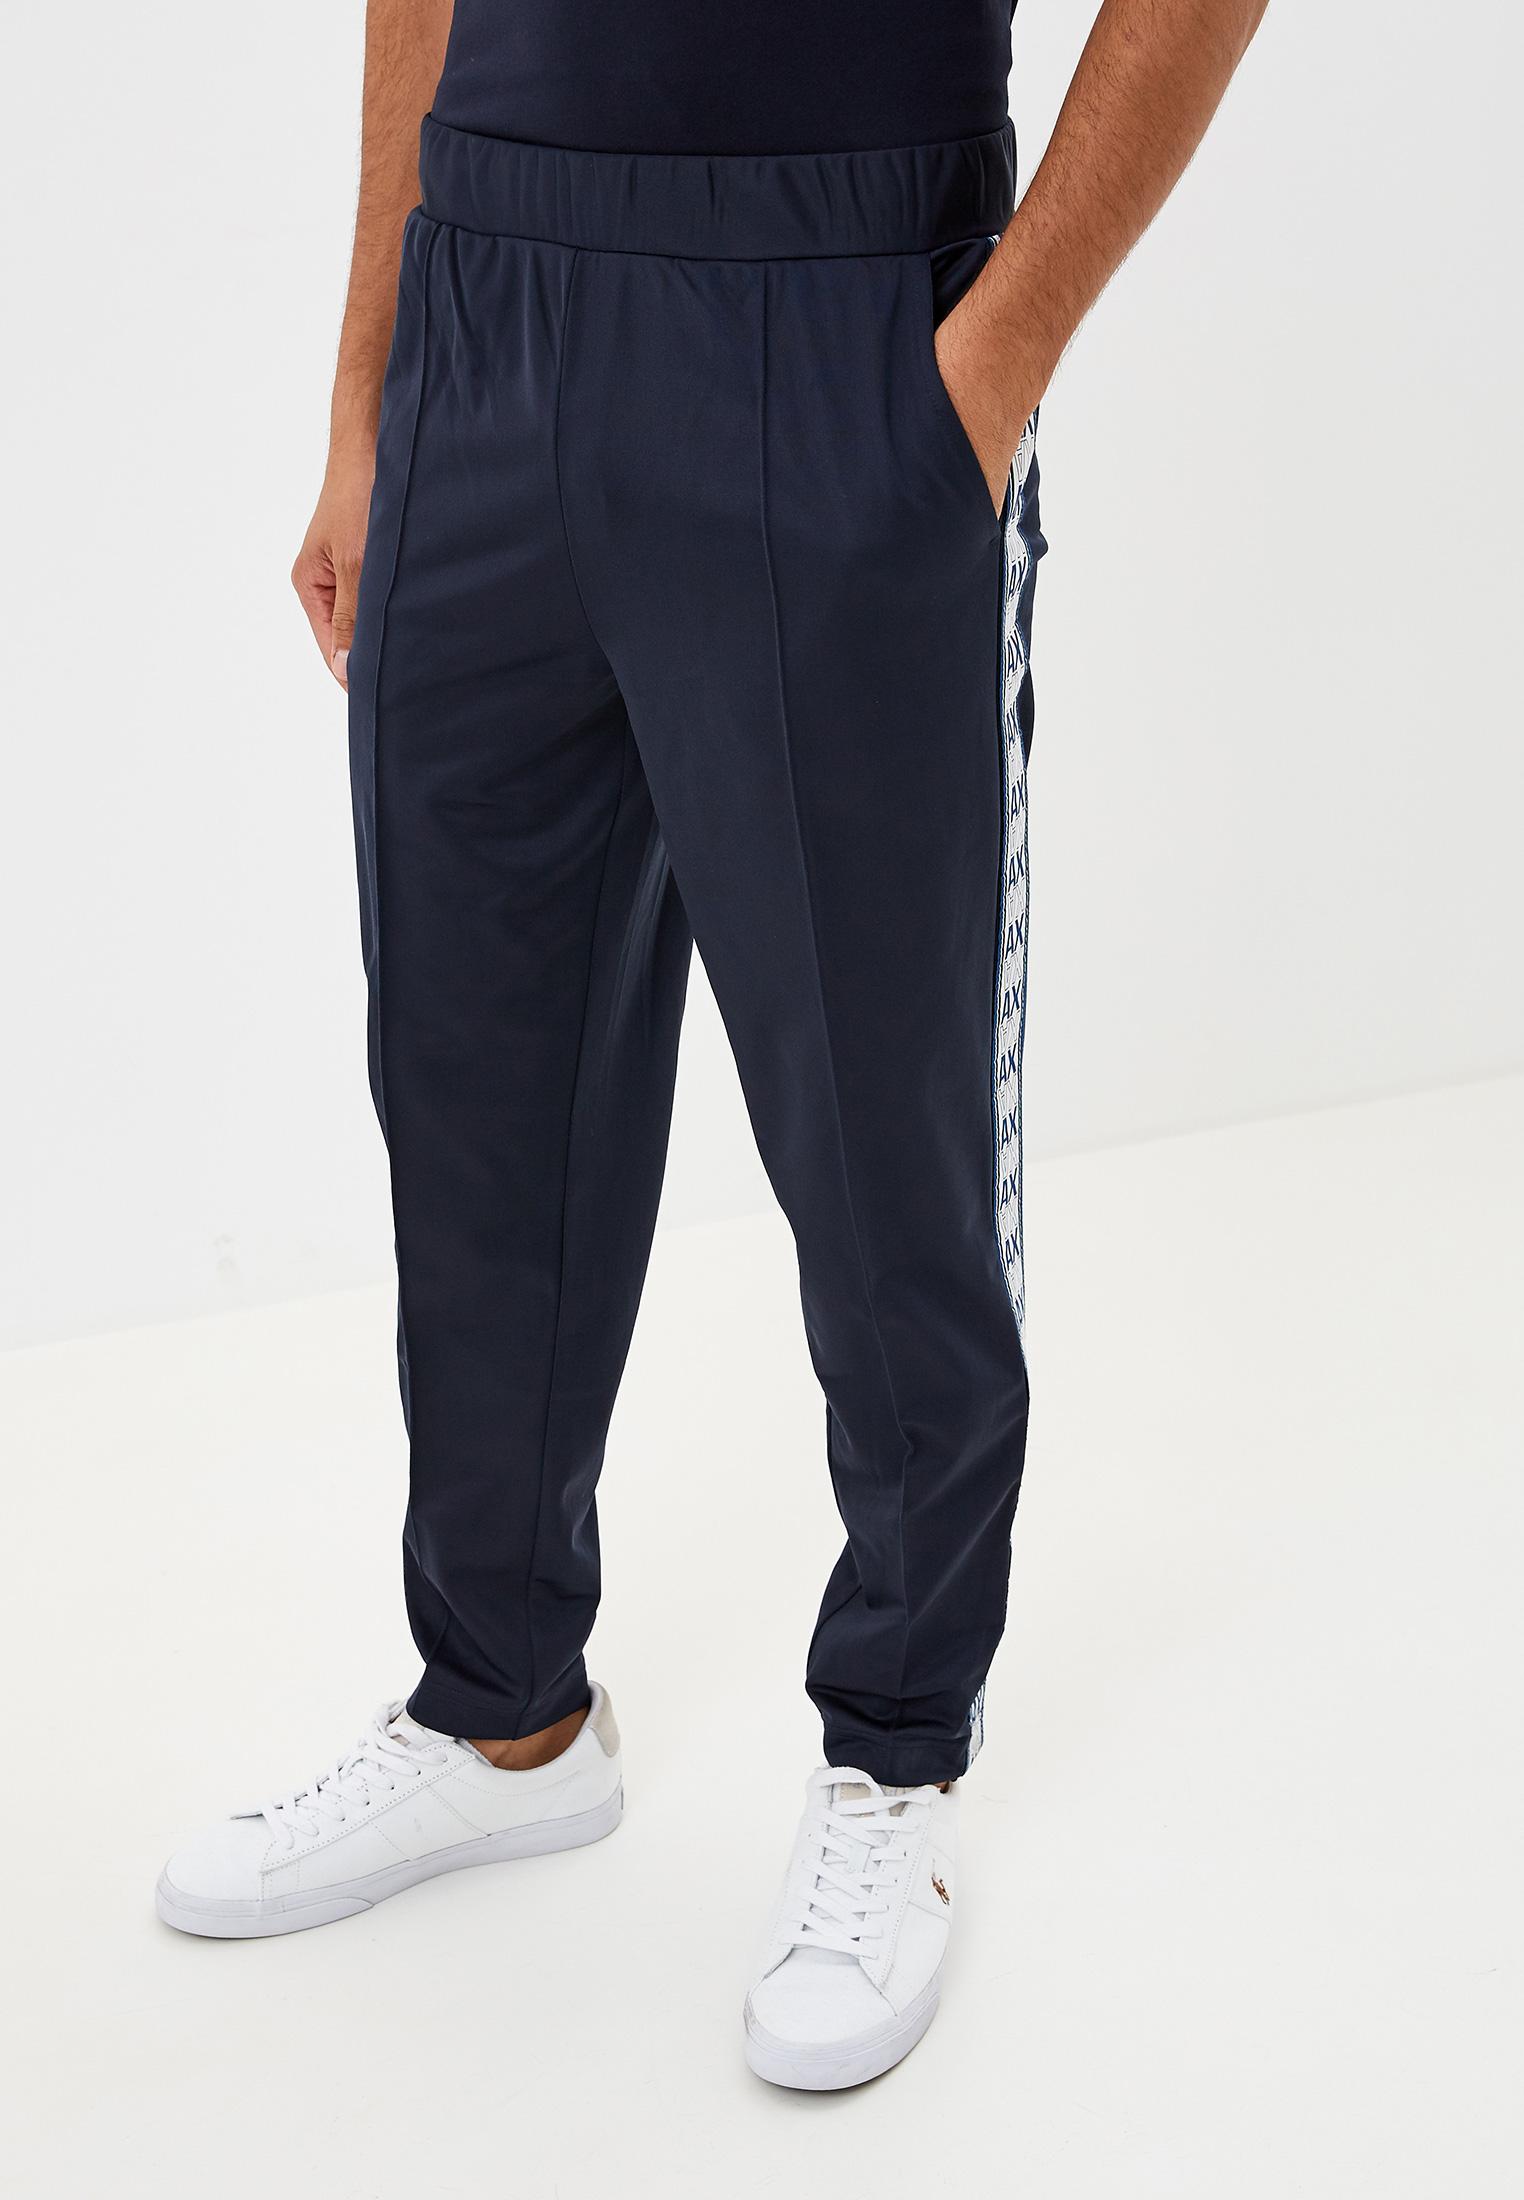 Мужские спортивные брюки Armani Exchange 6gzpbe Z8M8Z